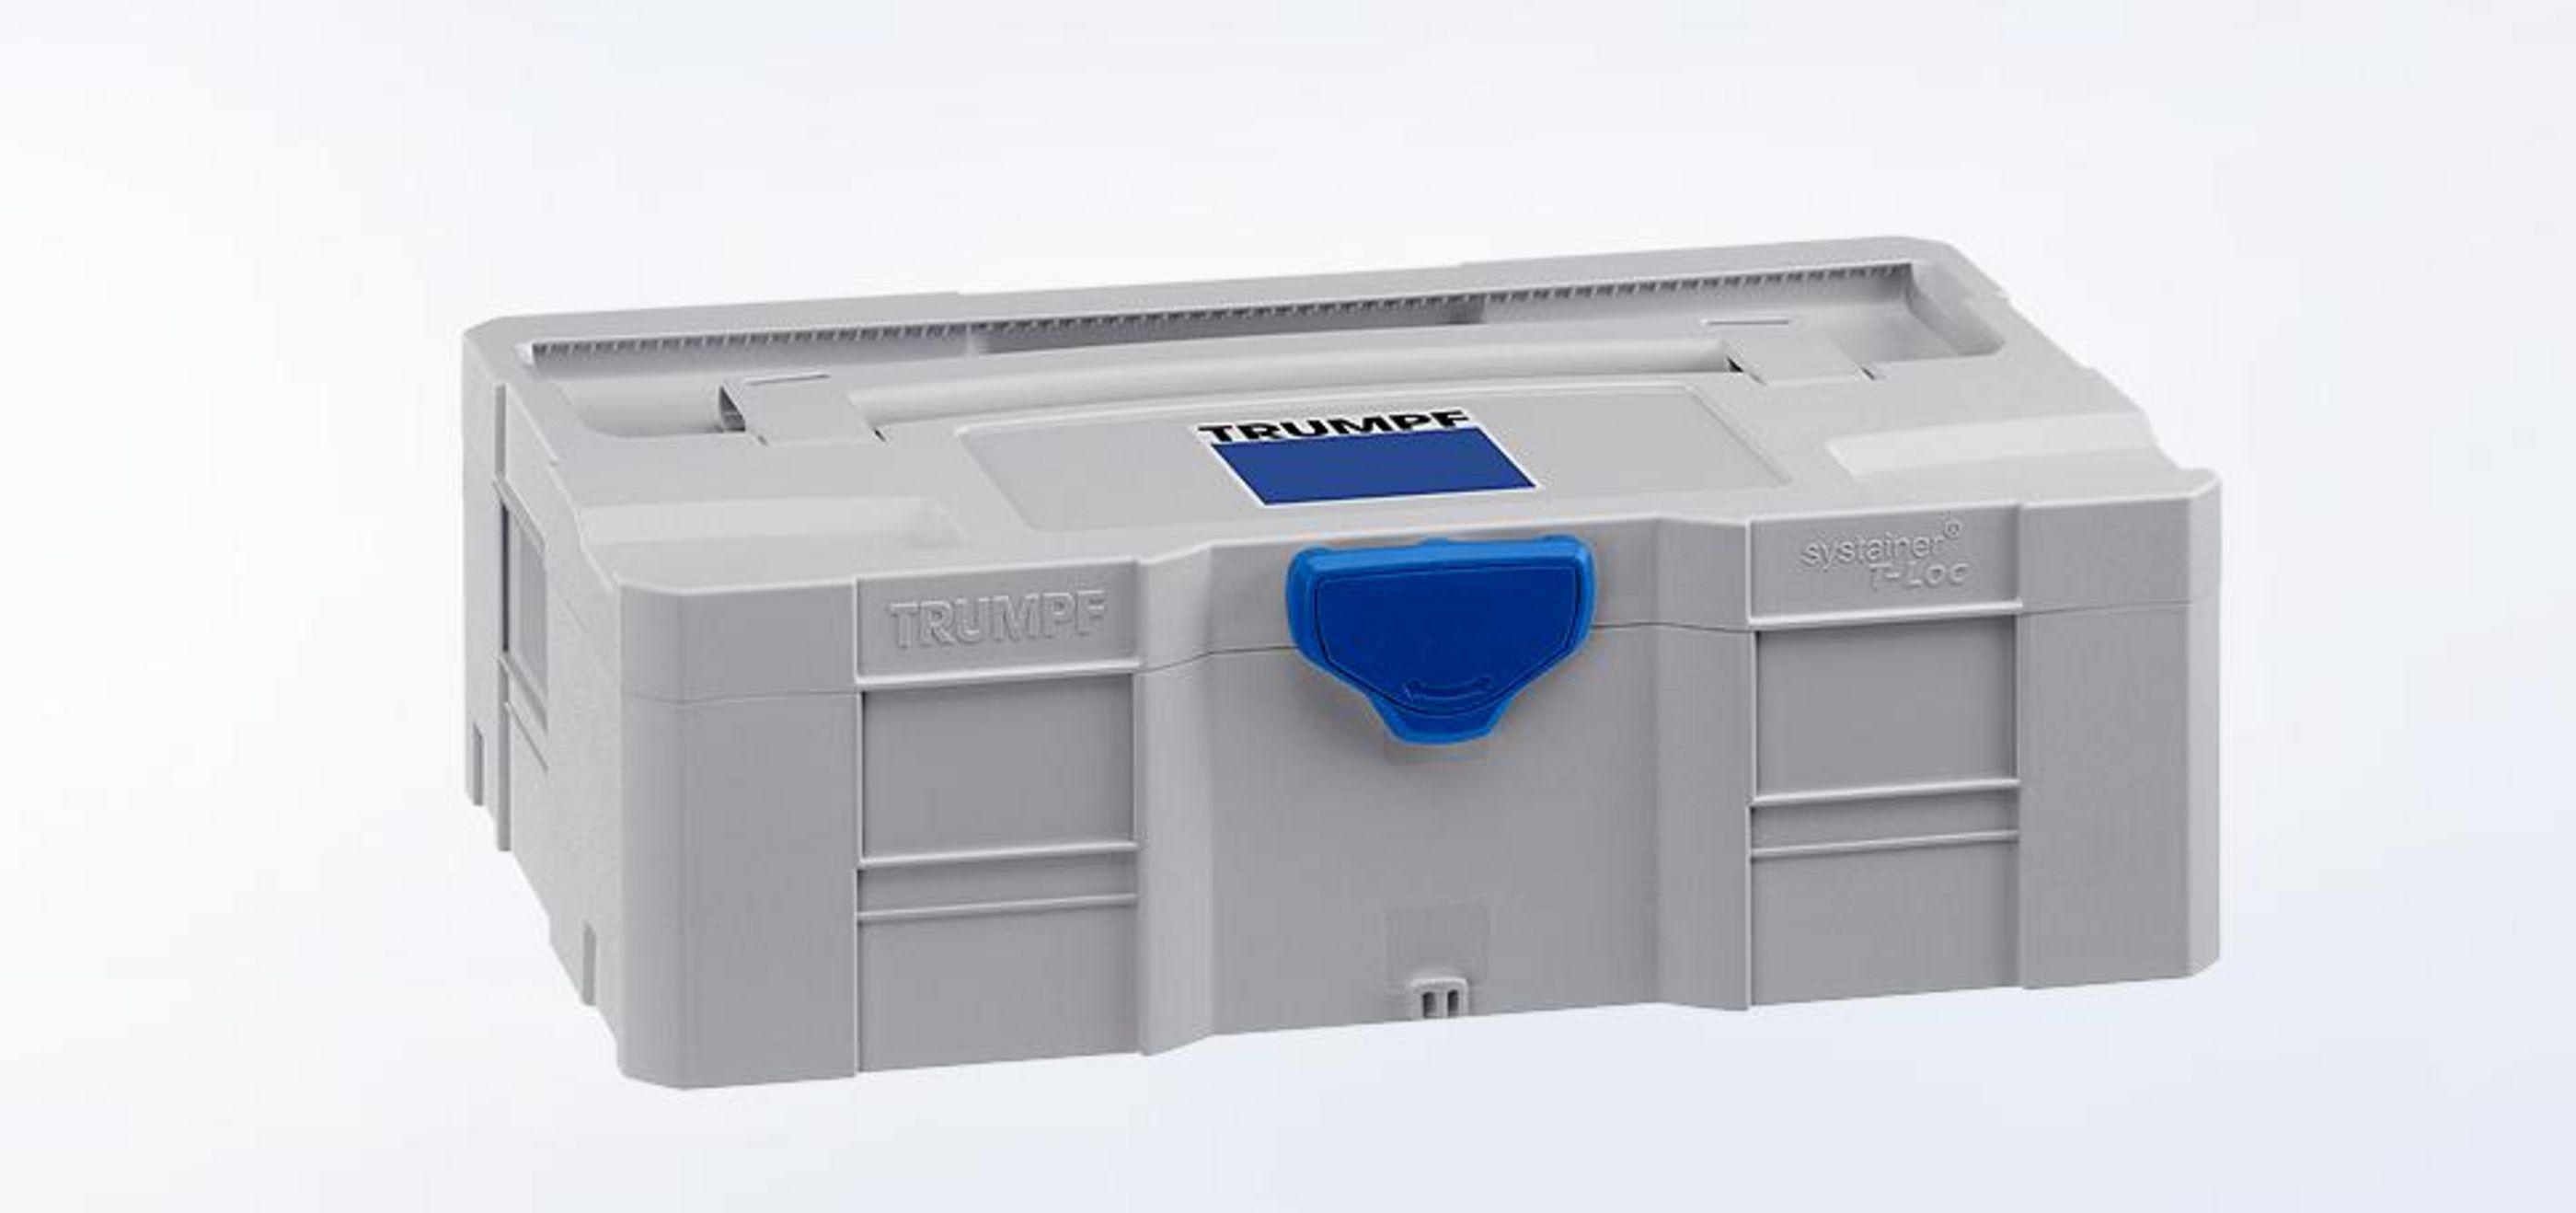 TRUMPF Box M2